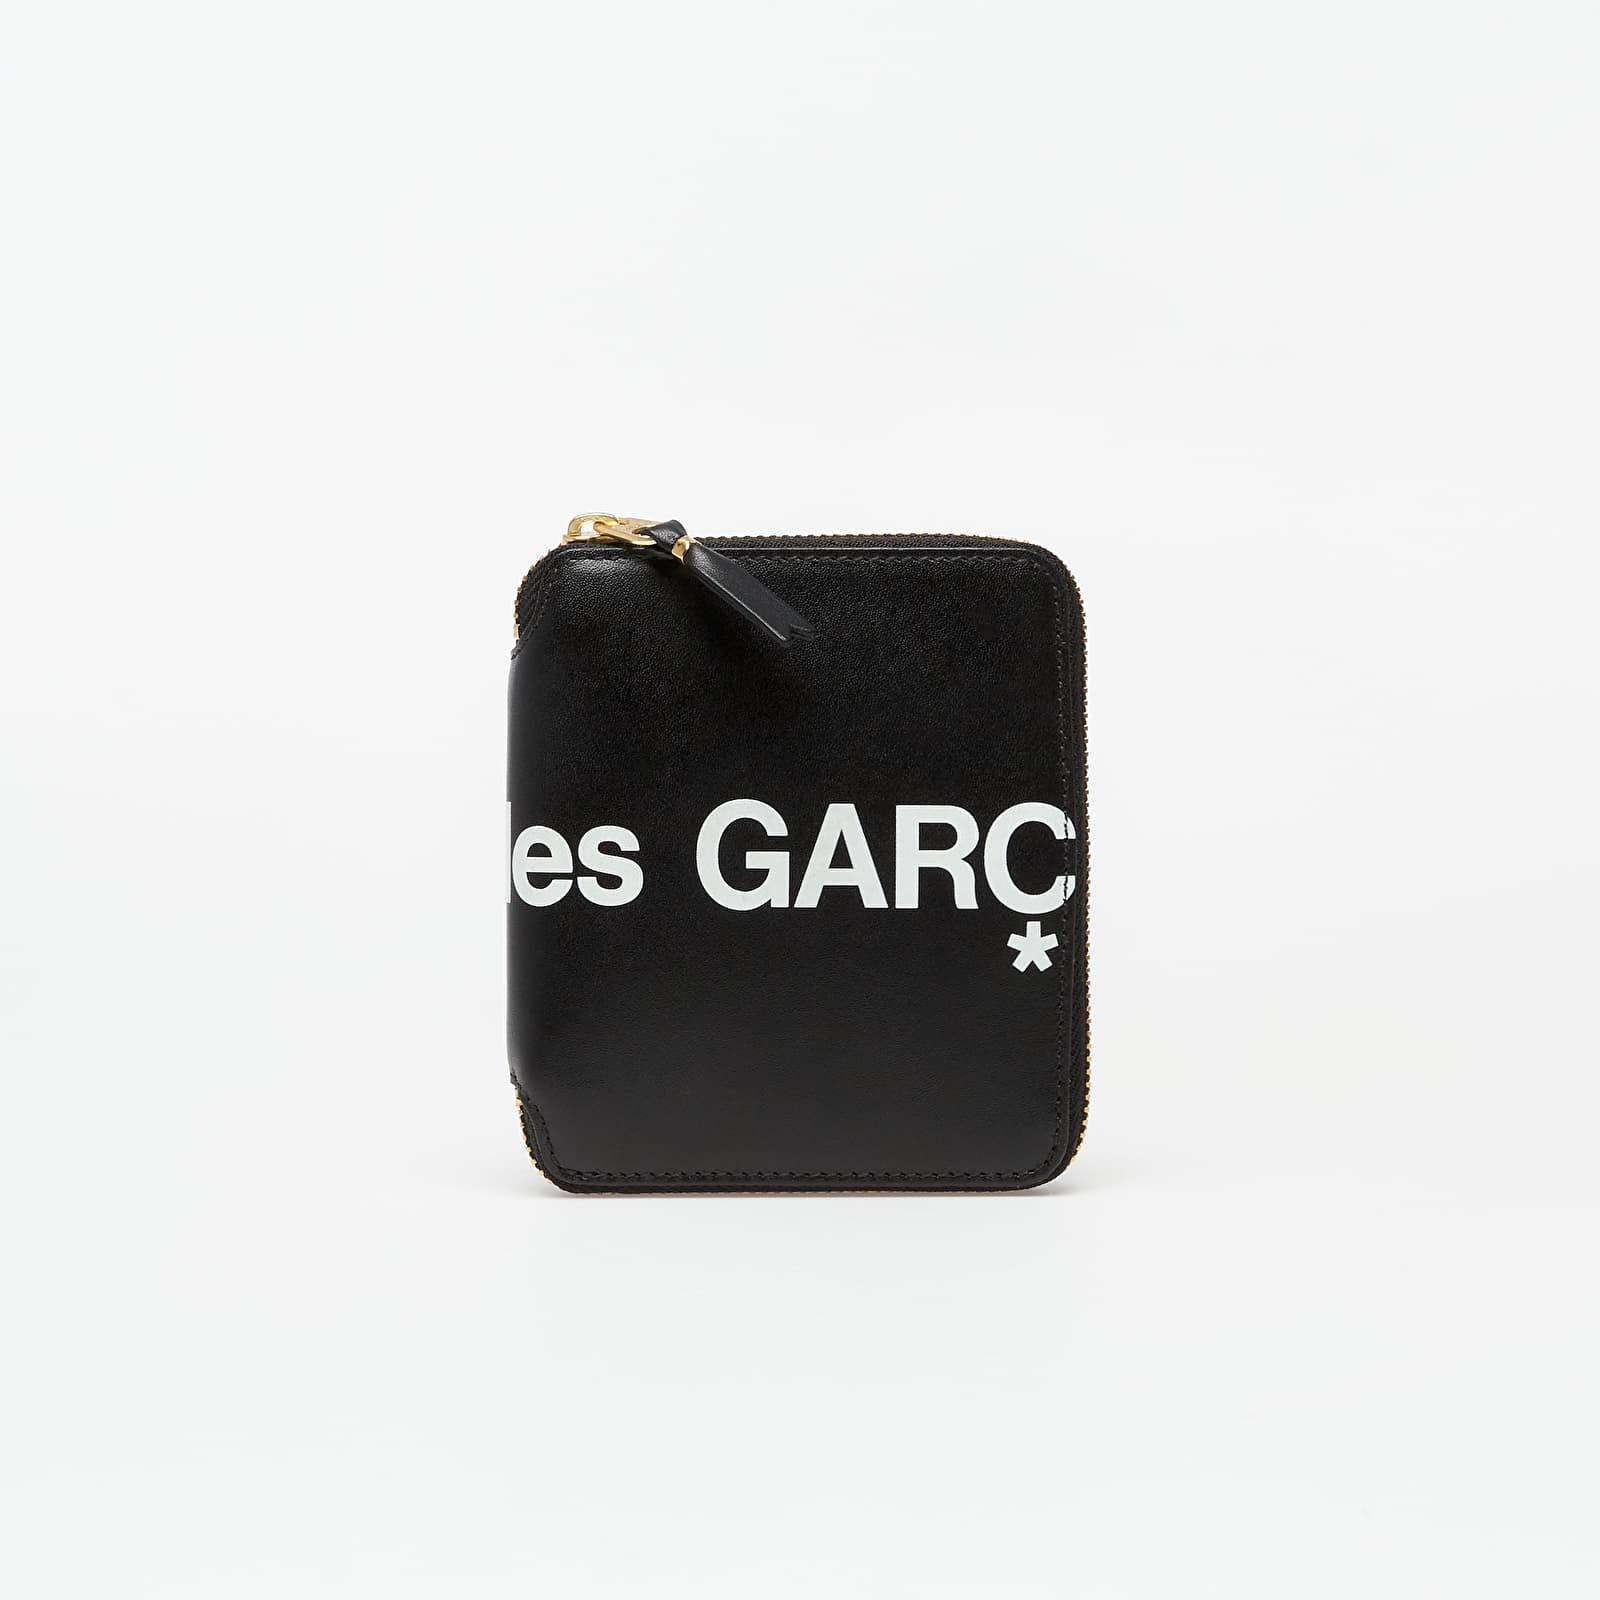 Peňaženky Comme des Garçons Huge Logo Wallet Black